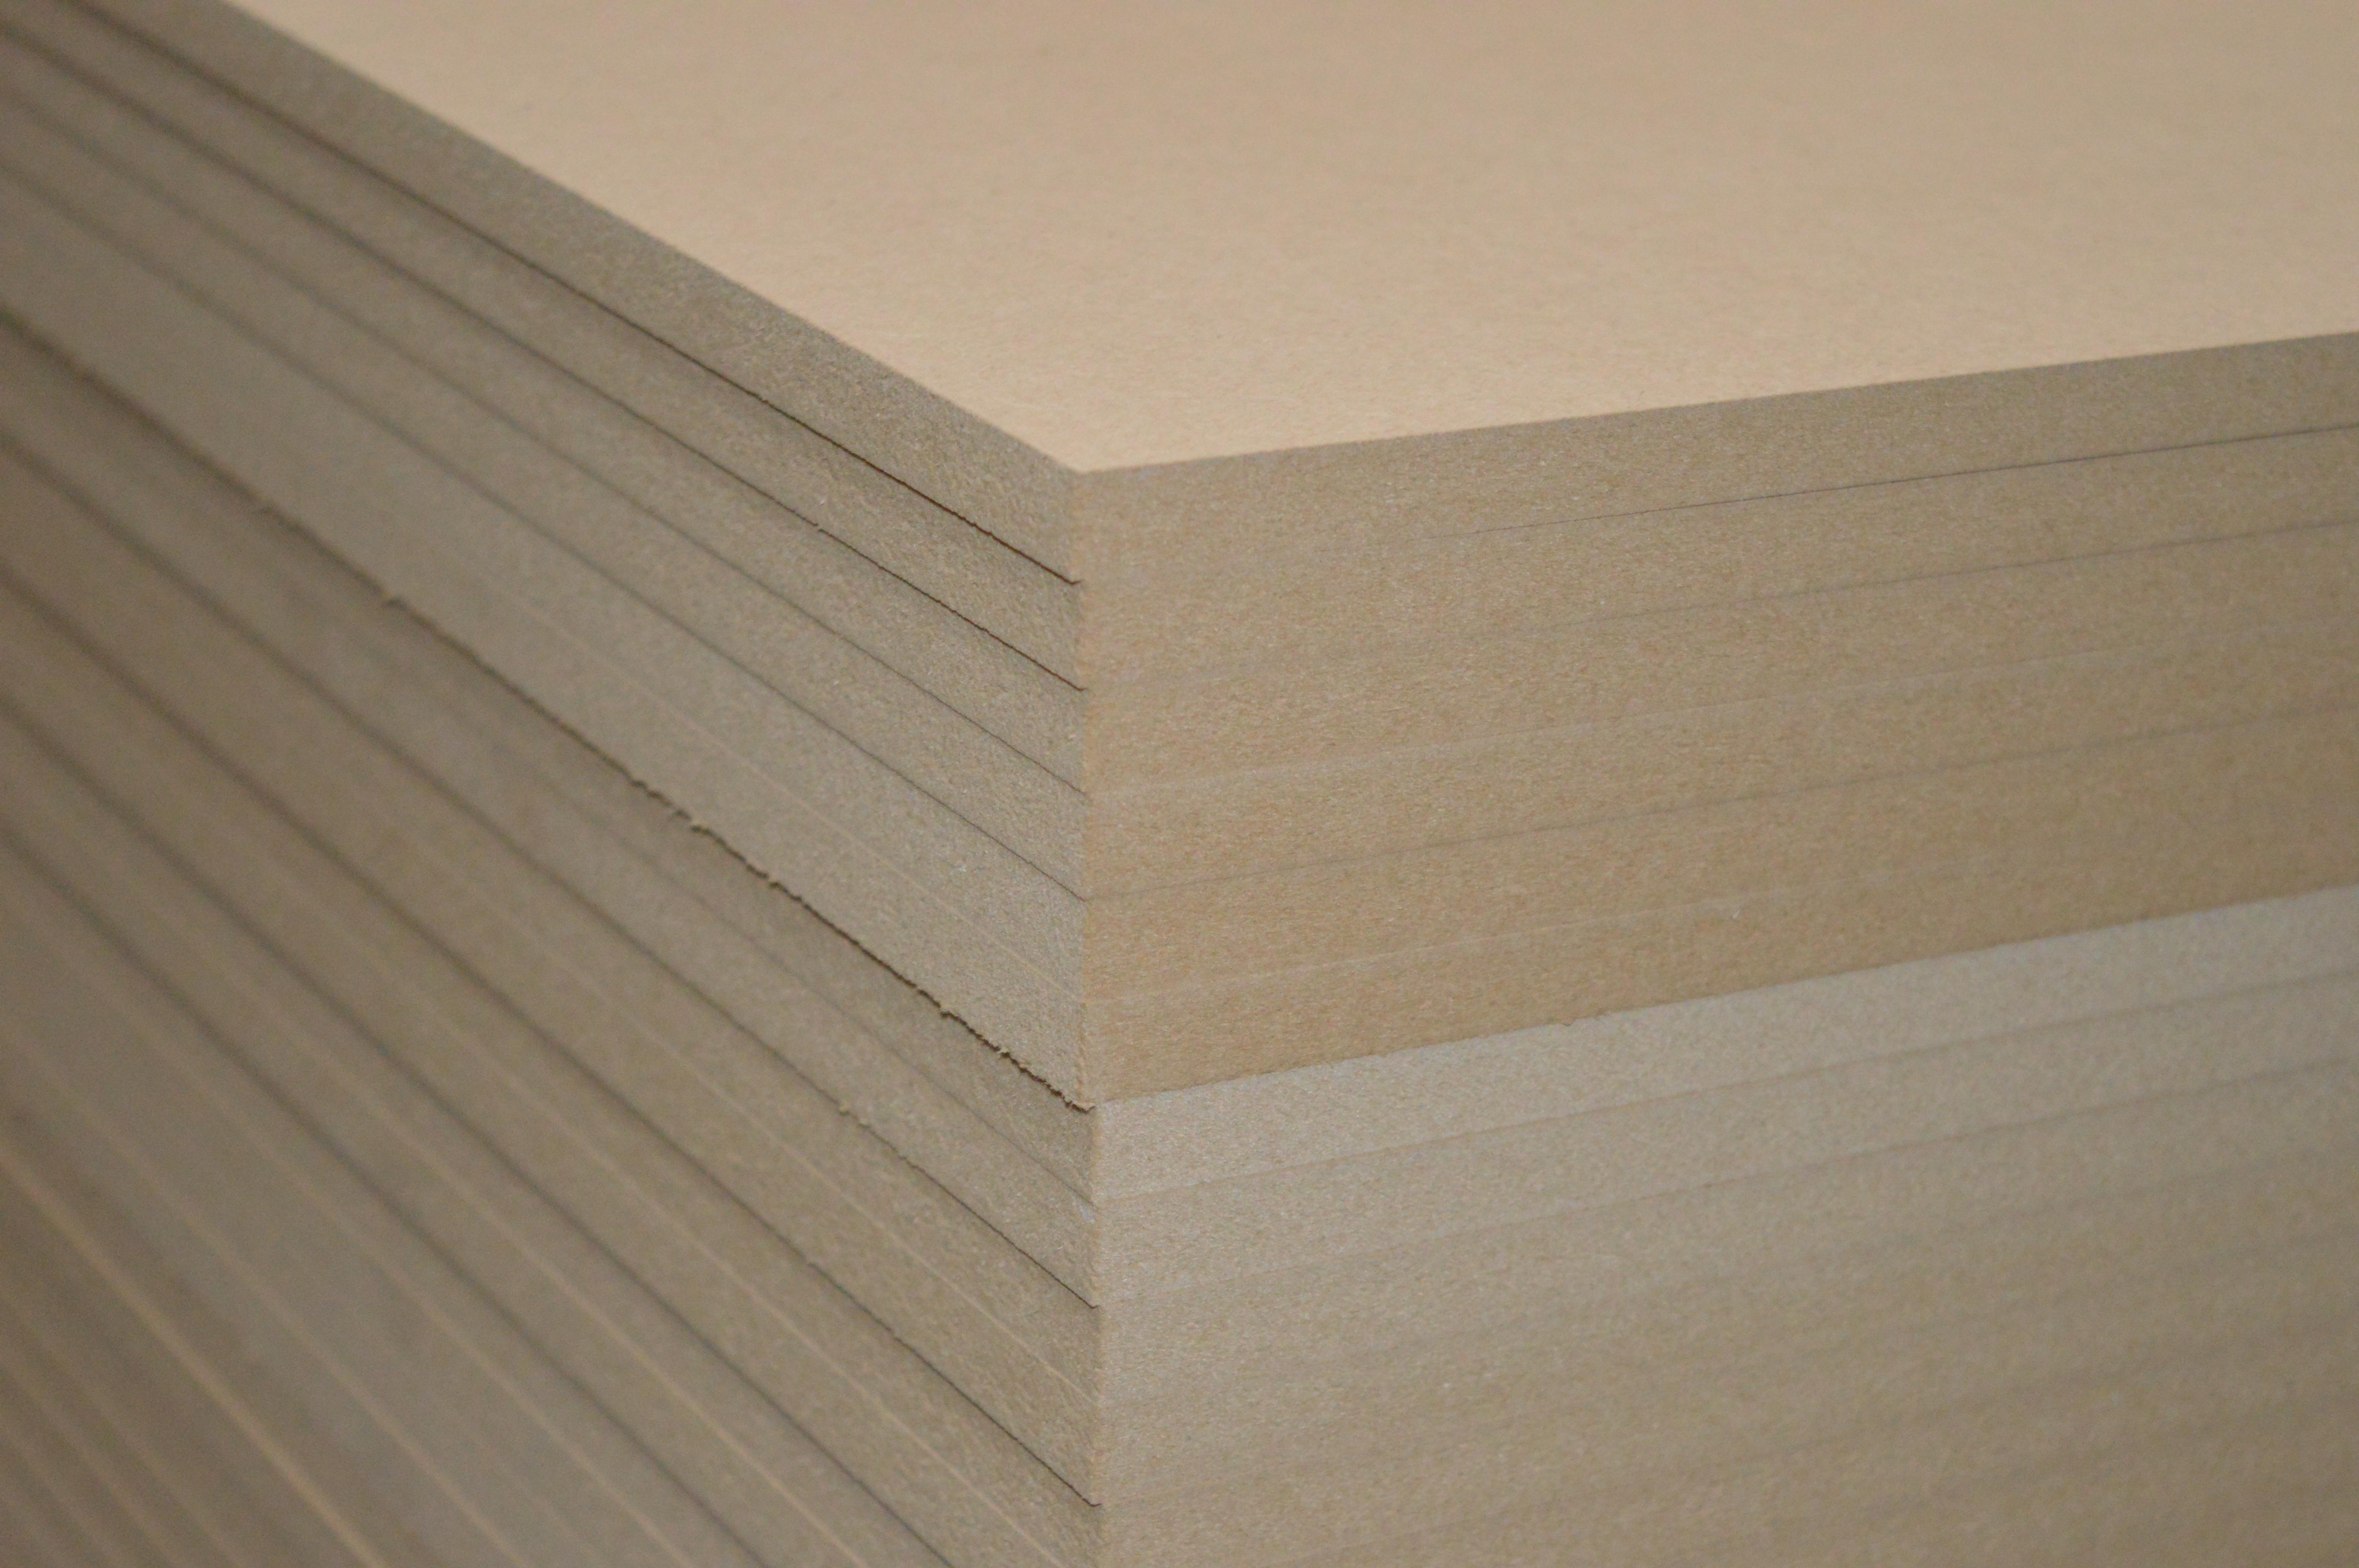 Standard MDF - Hanson Plywood